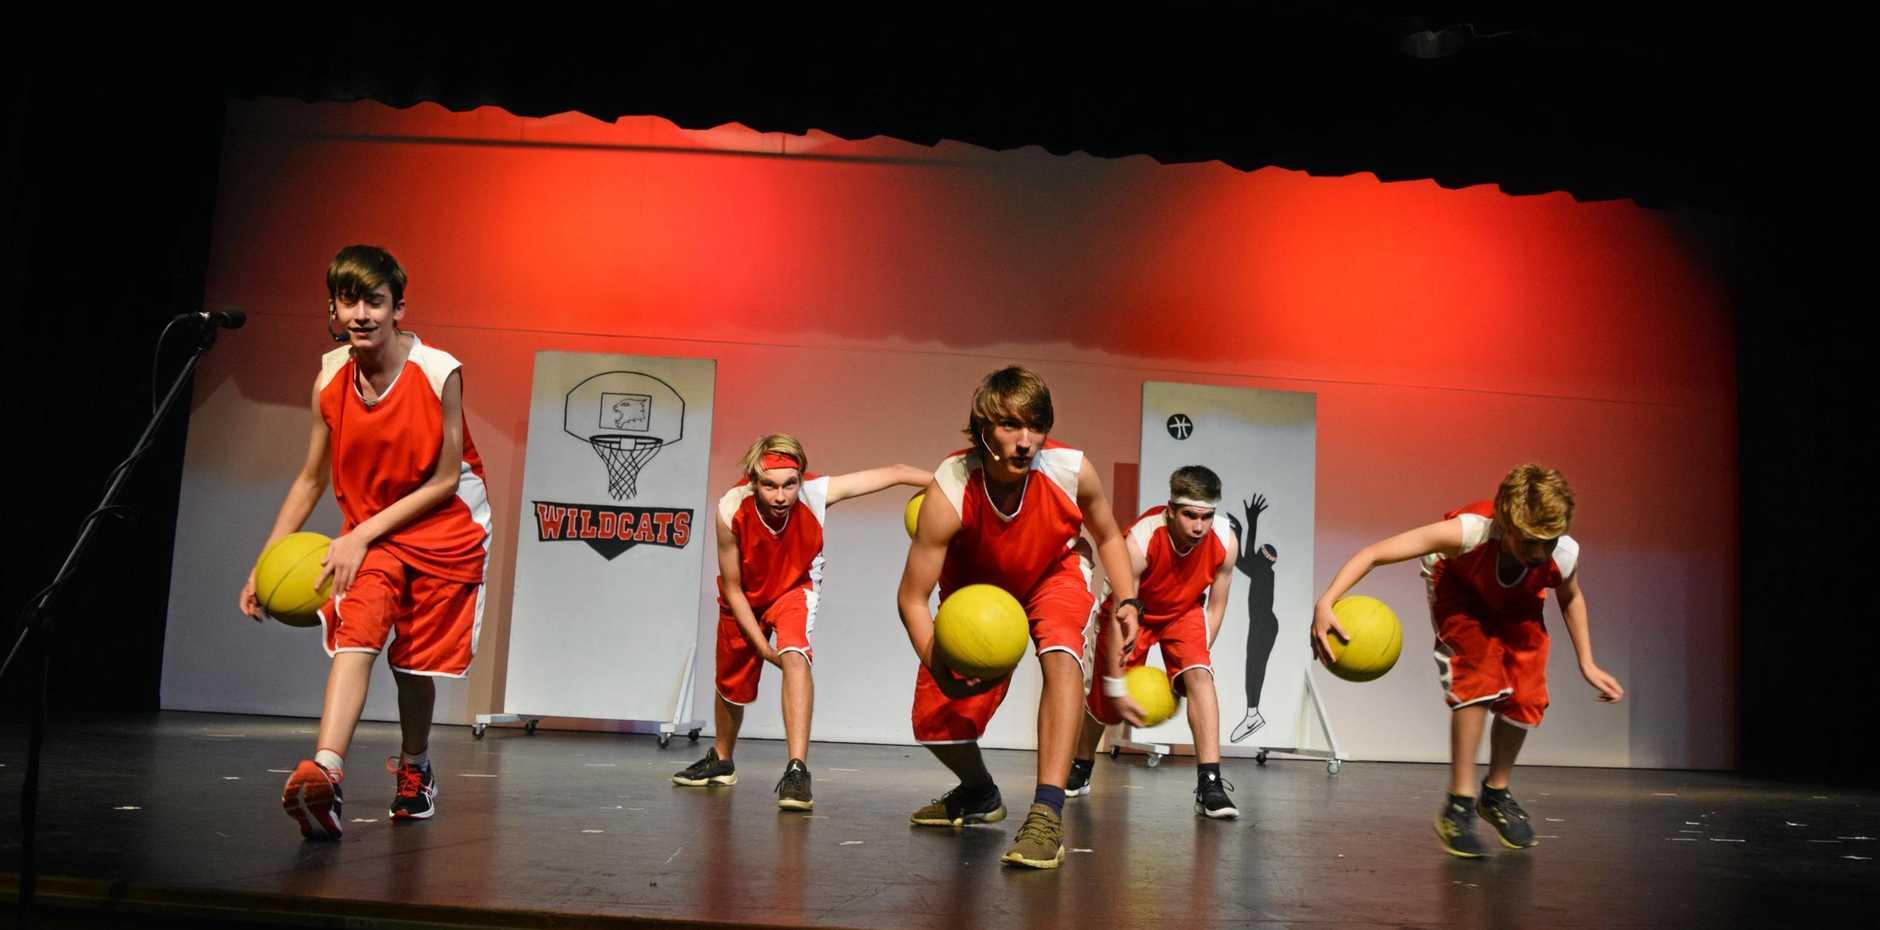 Biloela State High School students Loukas Vasiliadis, Noah Bongers, Stuart Arnold, Michael Steger and Riley Arnold on stage as the basketballers.